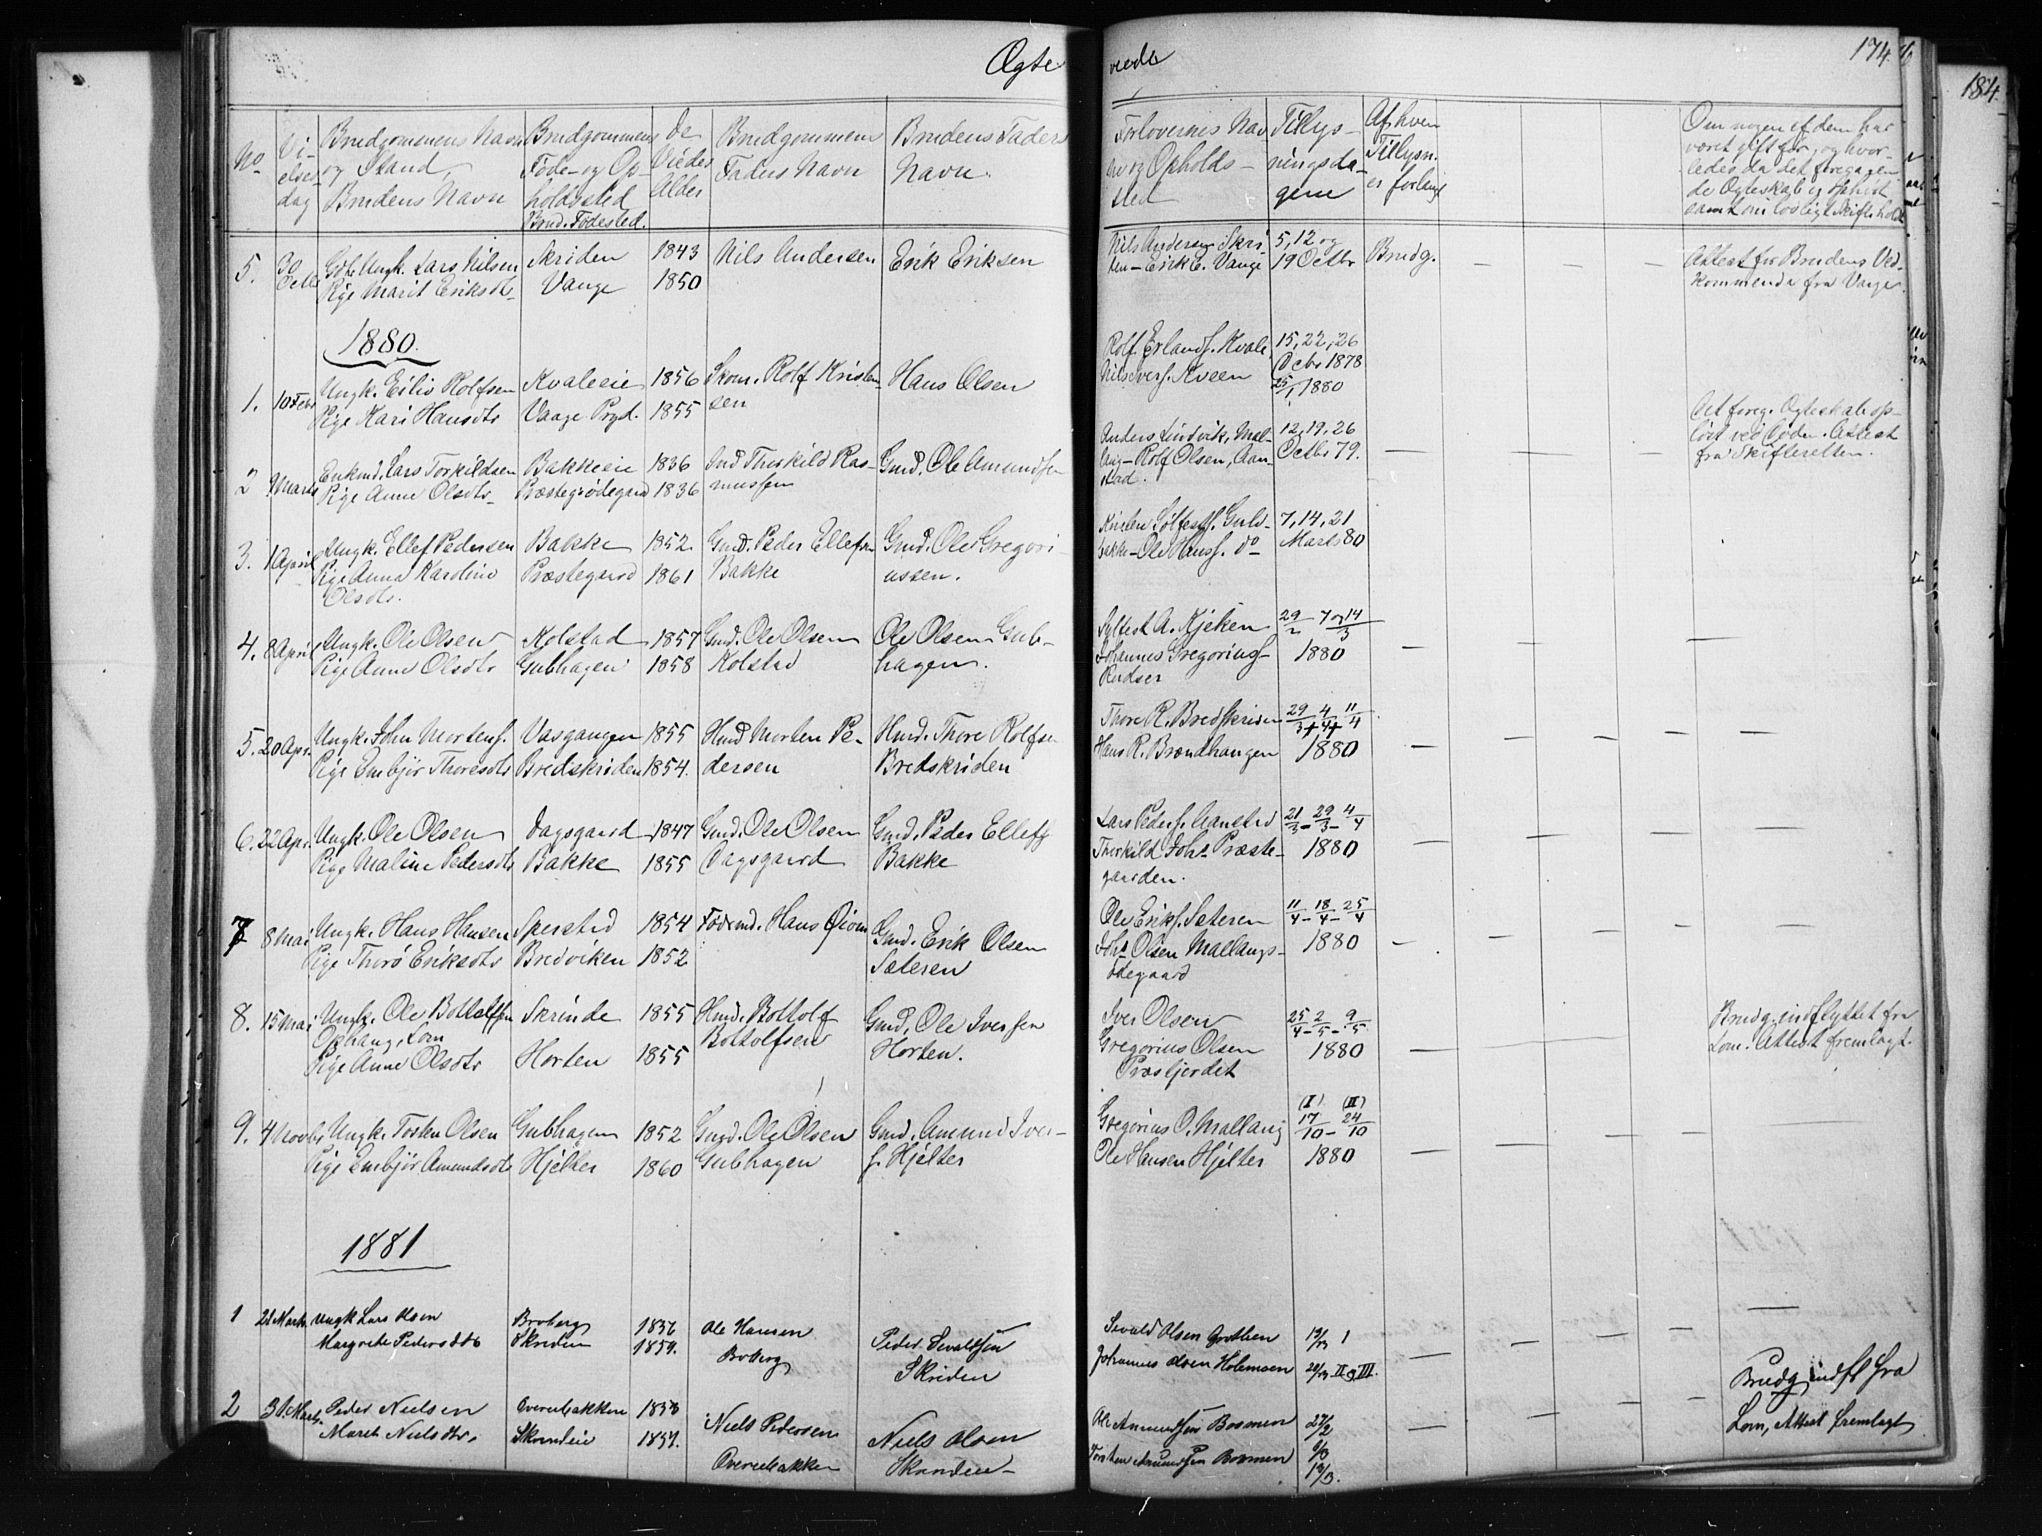 SAH, Skjåk prestekontor, Klokkerbok nr. 1, 1865-1893, s. 174